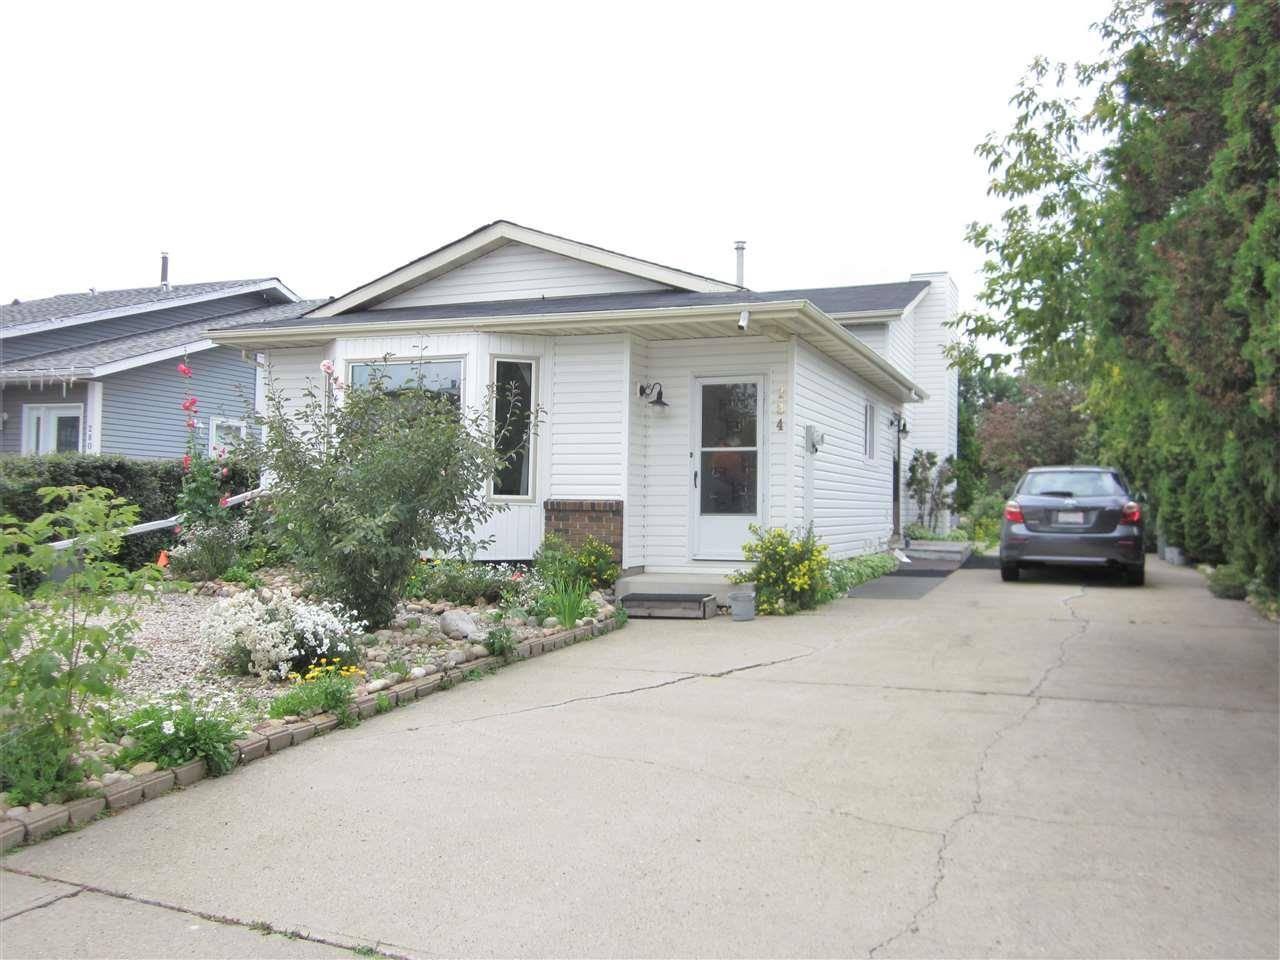 House for sale at 284 Lago Lindo Cres Nw Edmonton Alberta - MLS: E4170881